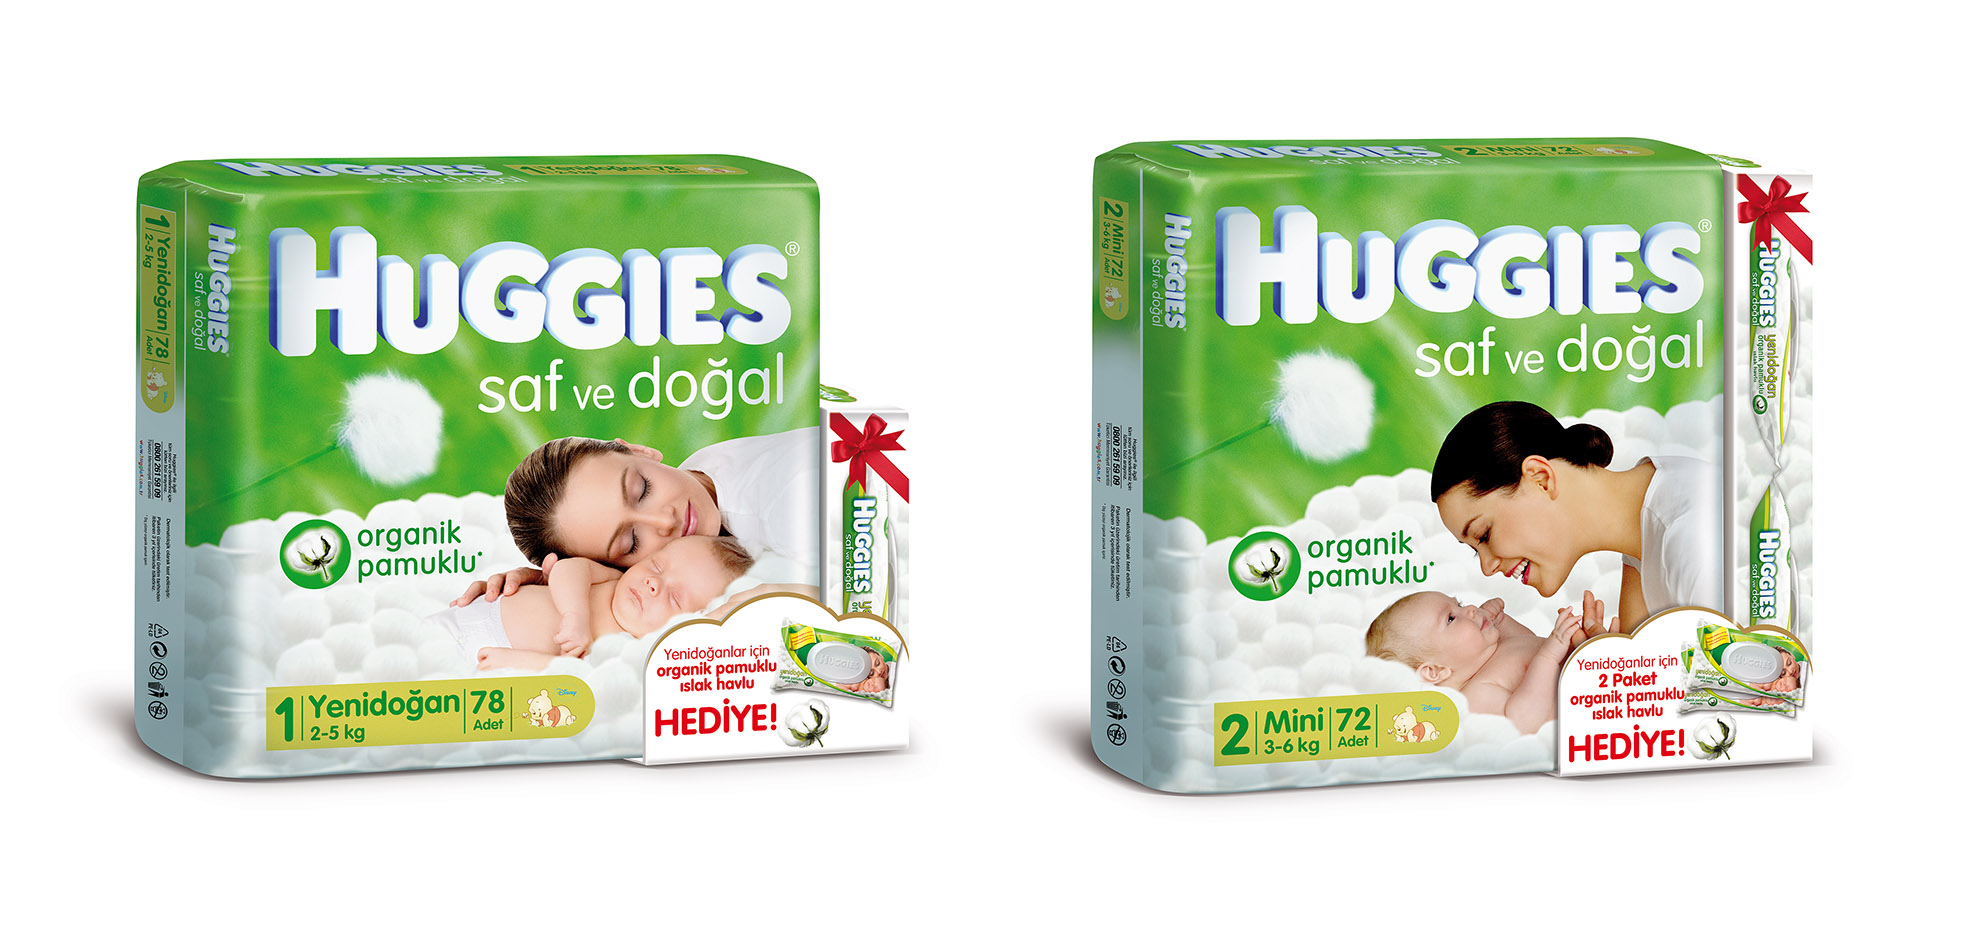 huggies04